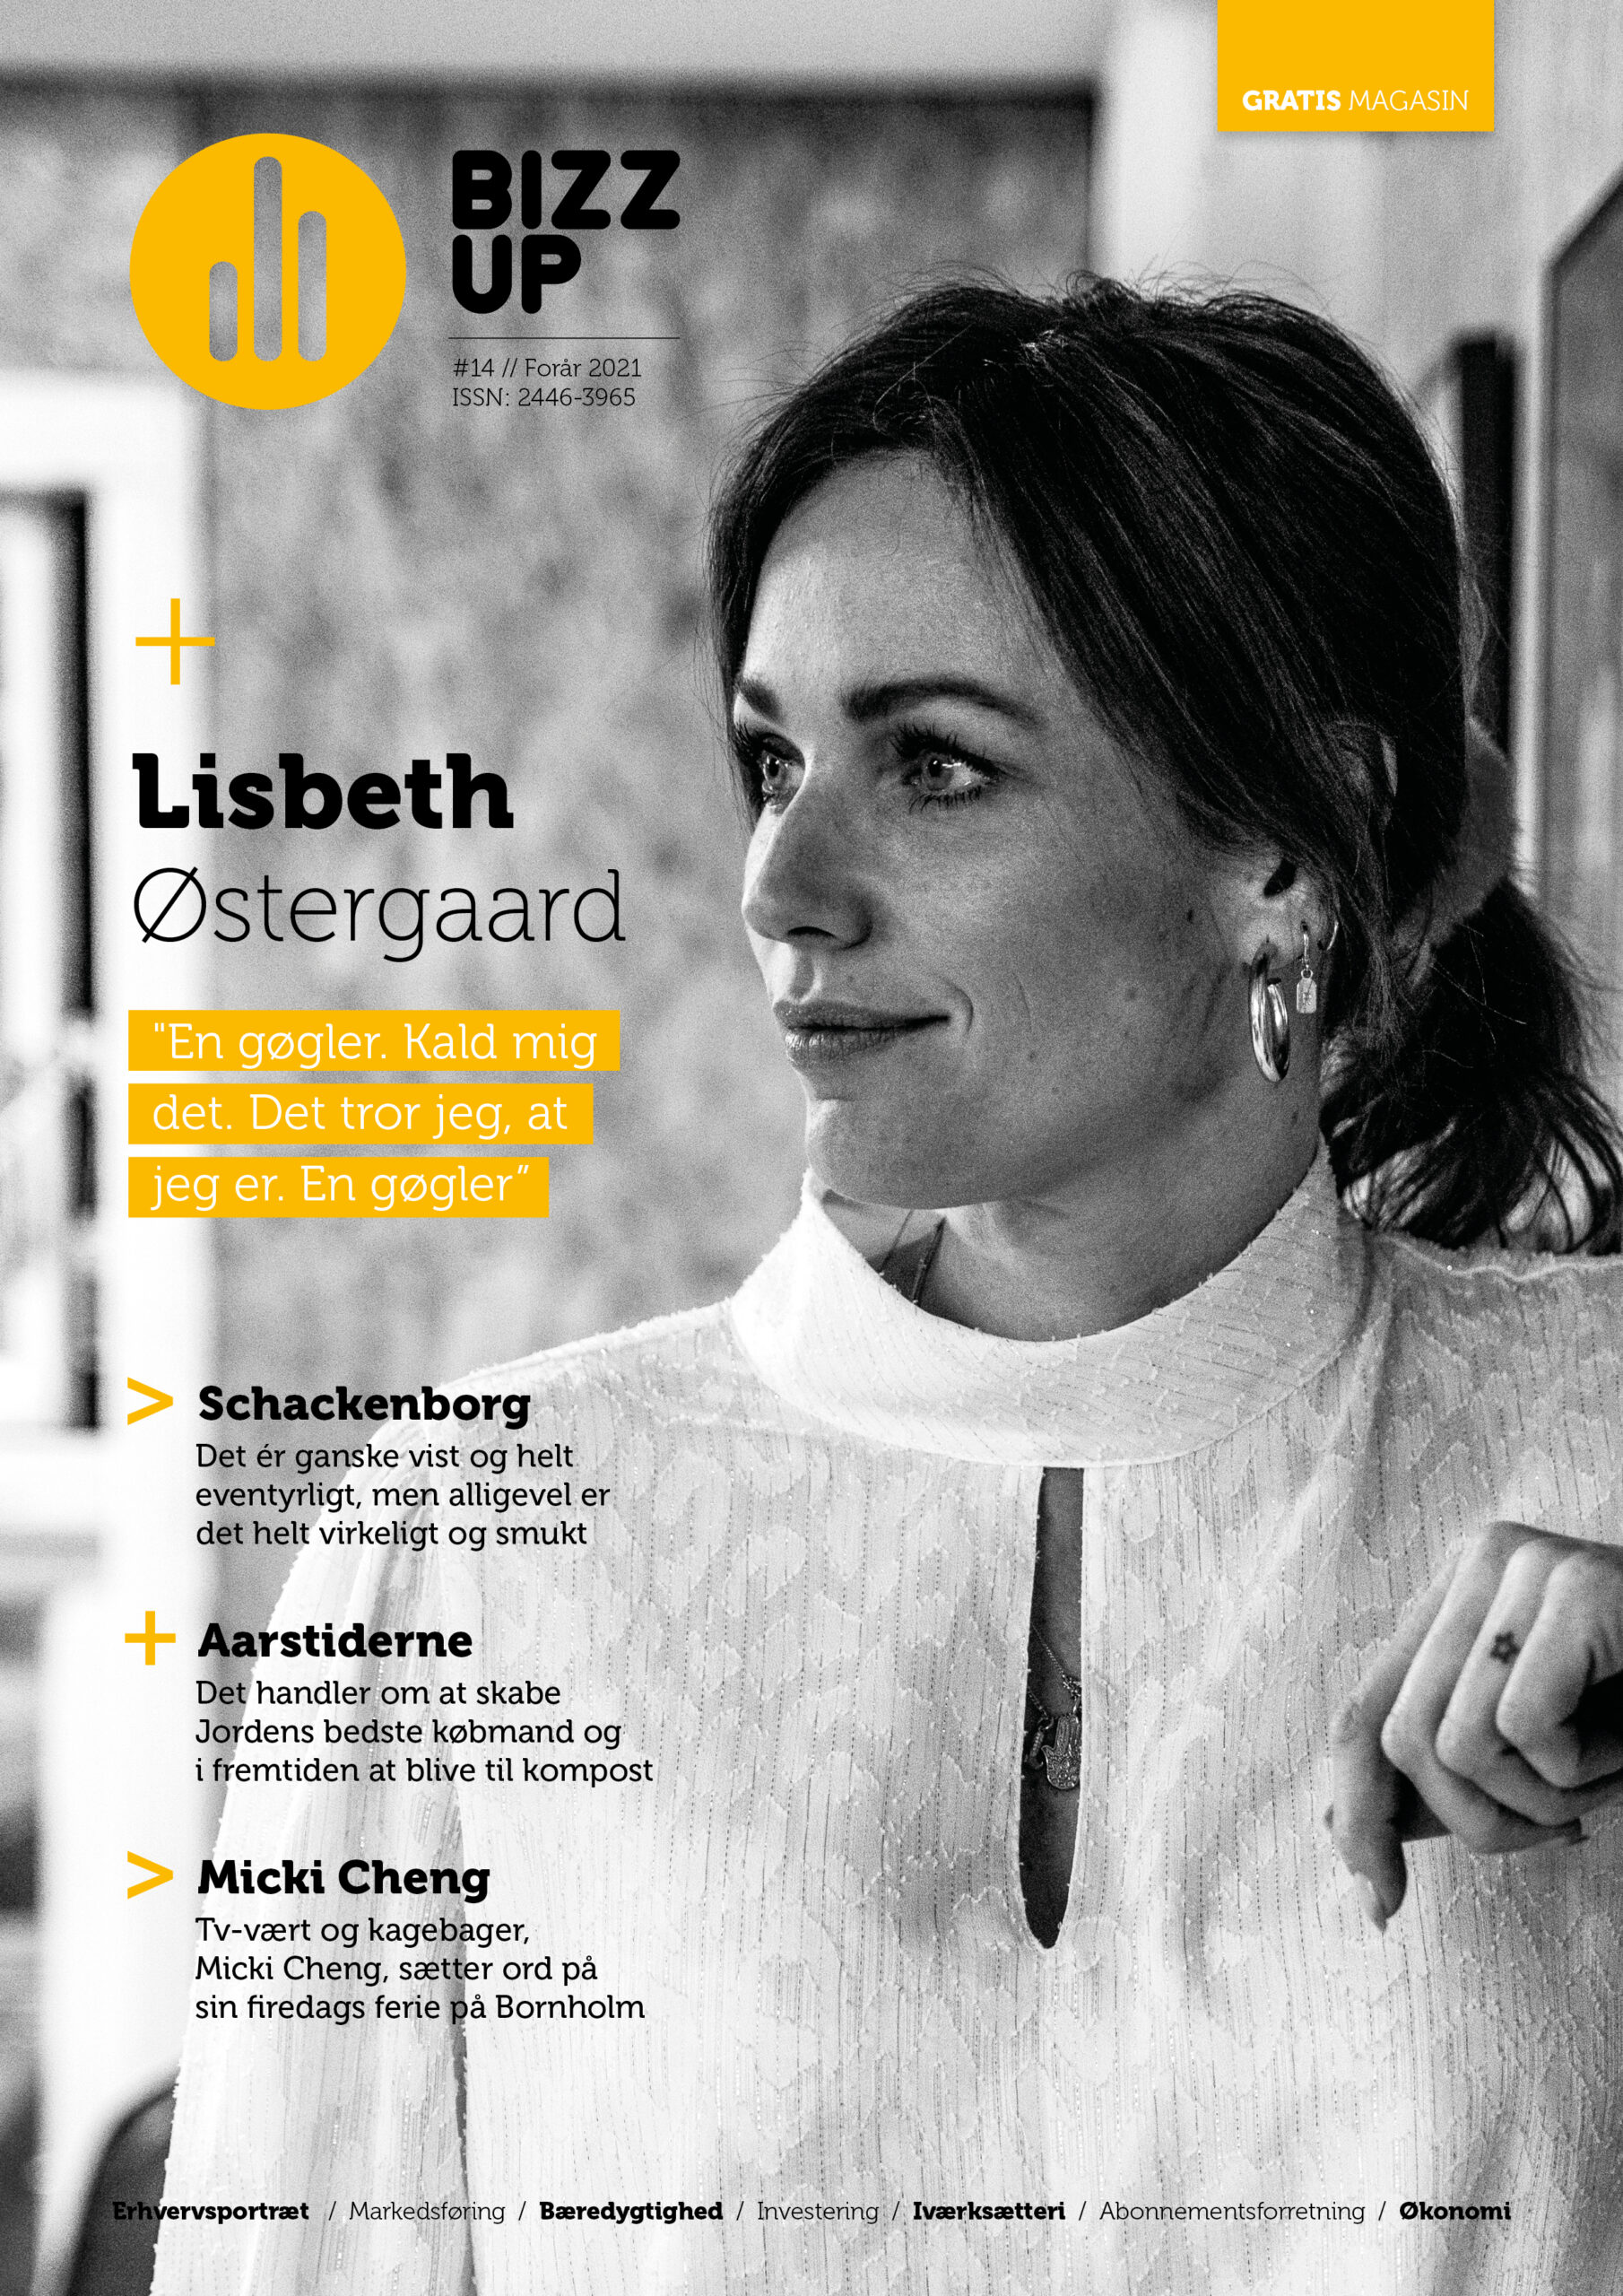 Bizz Up Forår 2021, Lisbeth Østergaard, Bizzup.dk, Bizz Up